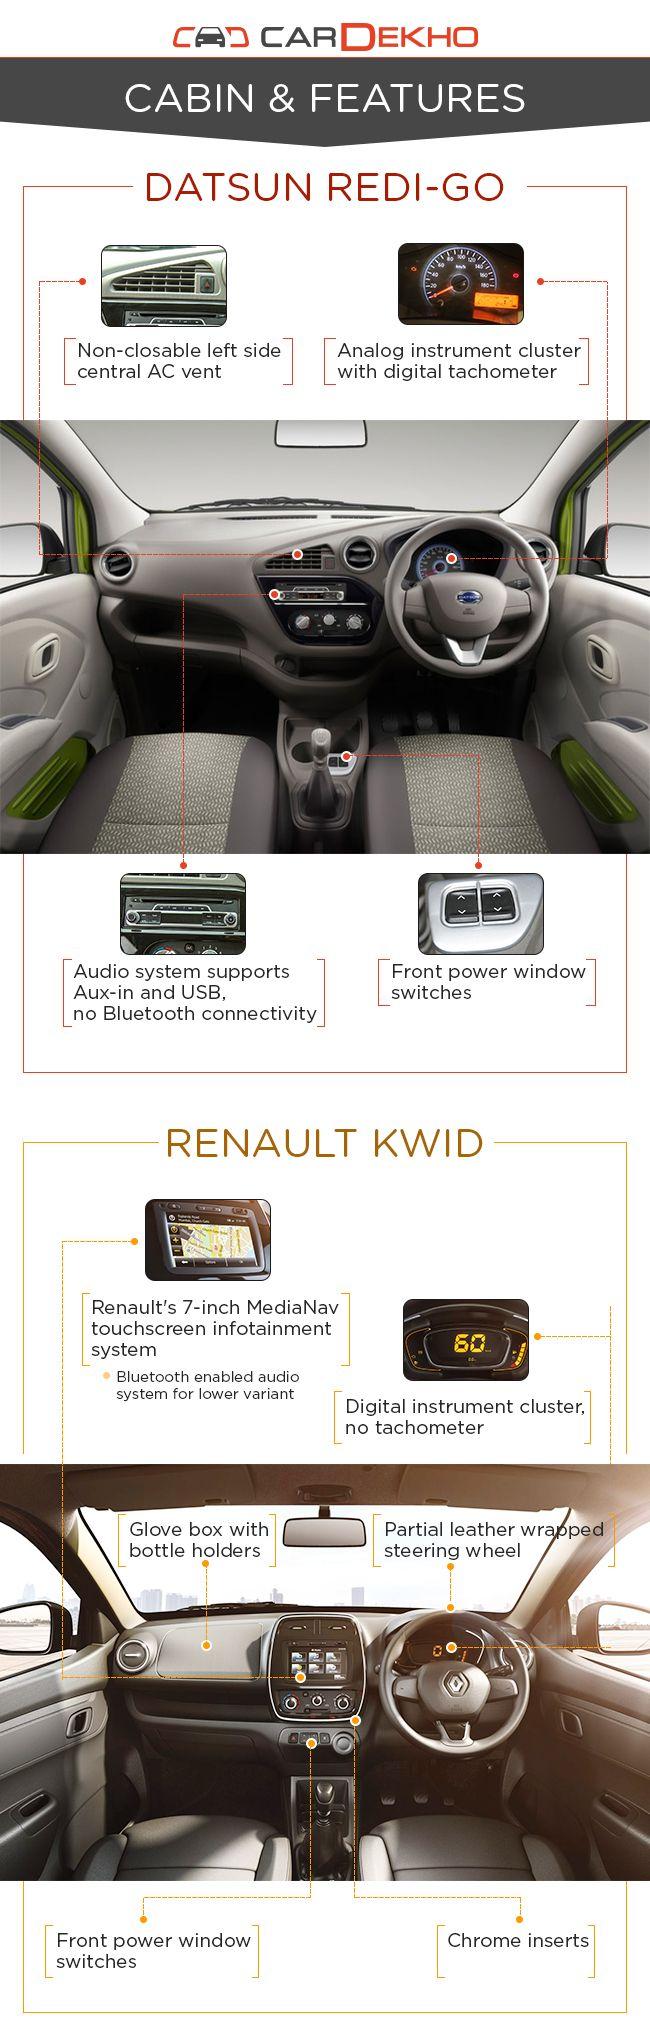 Renault Kwid vs Datsun redi-GO